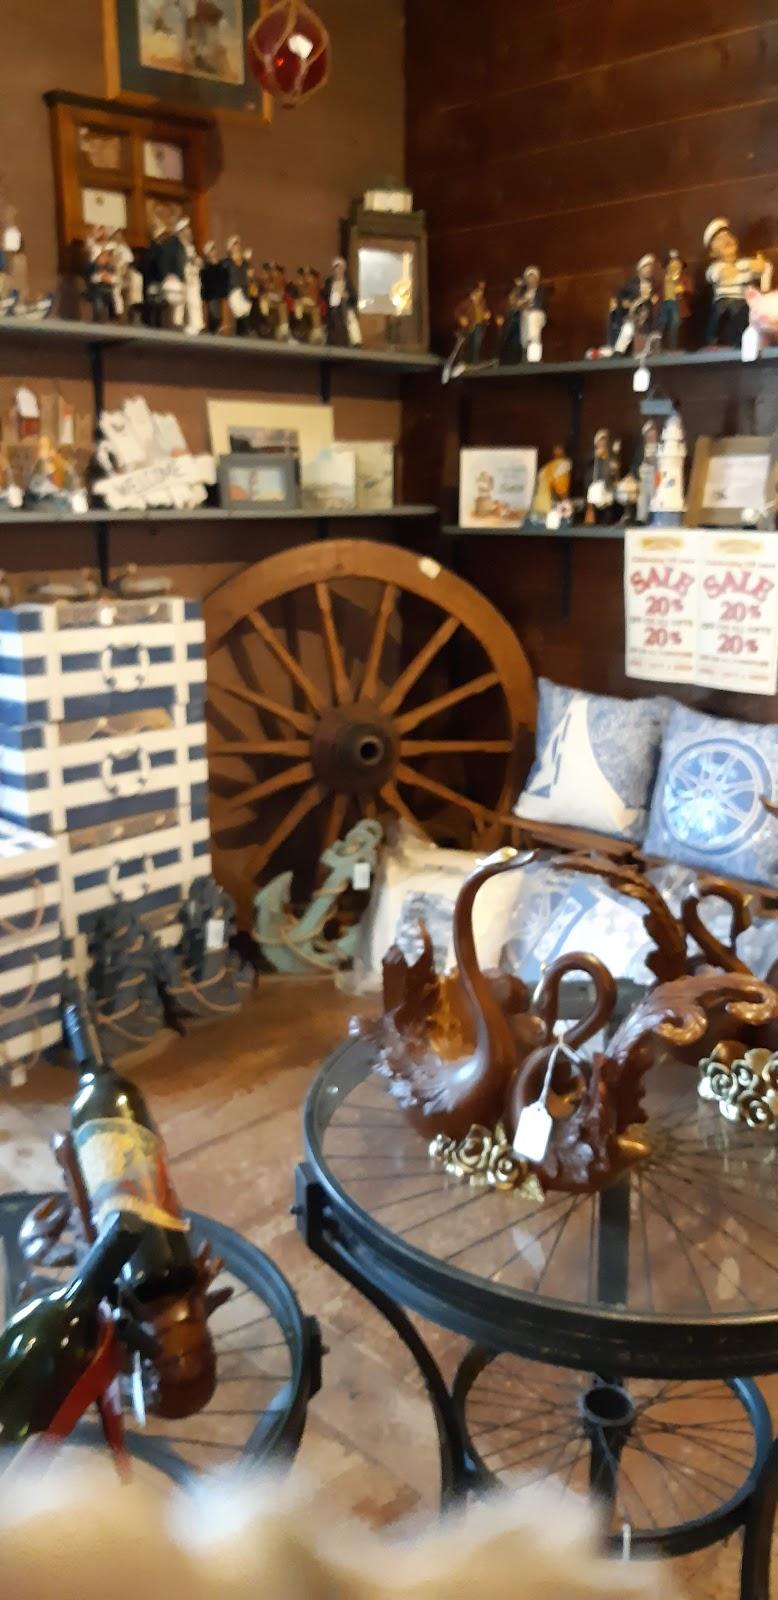 Dominion Chair General Store | store | 5637 Nova Scotia Trunk 2, Bass River, NS B0M 1B0, Canada | 9026472210 OR +1 902-647-2210